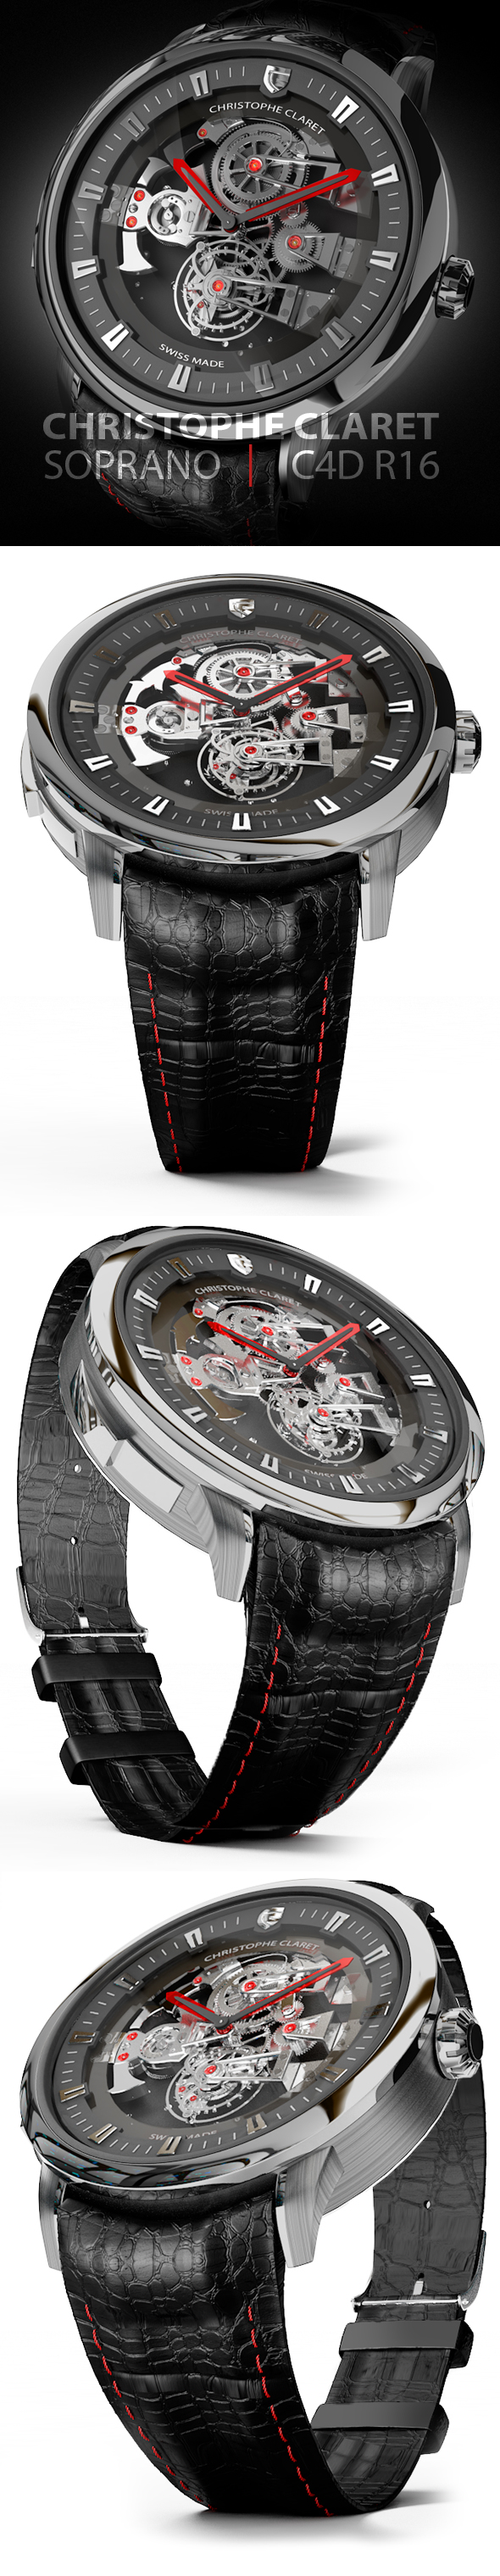 Christophe Claret Soprano Watch - 3DOcean Item for Sale